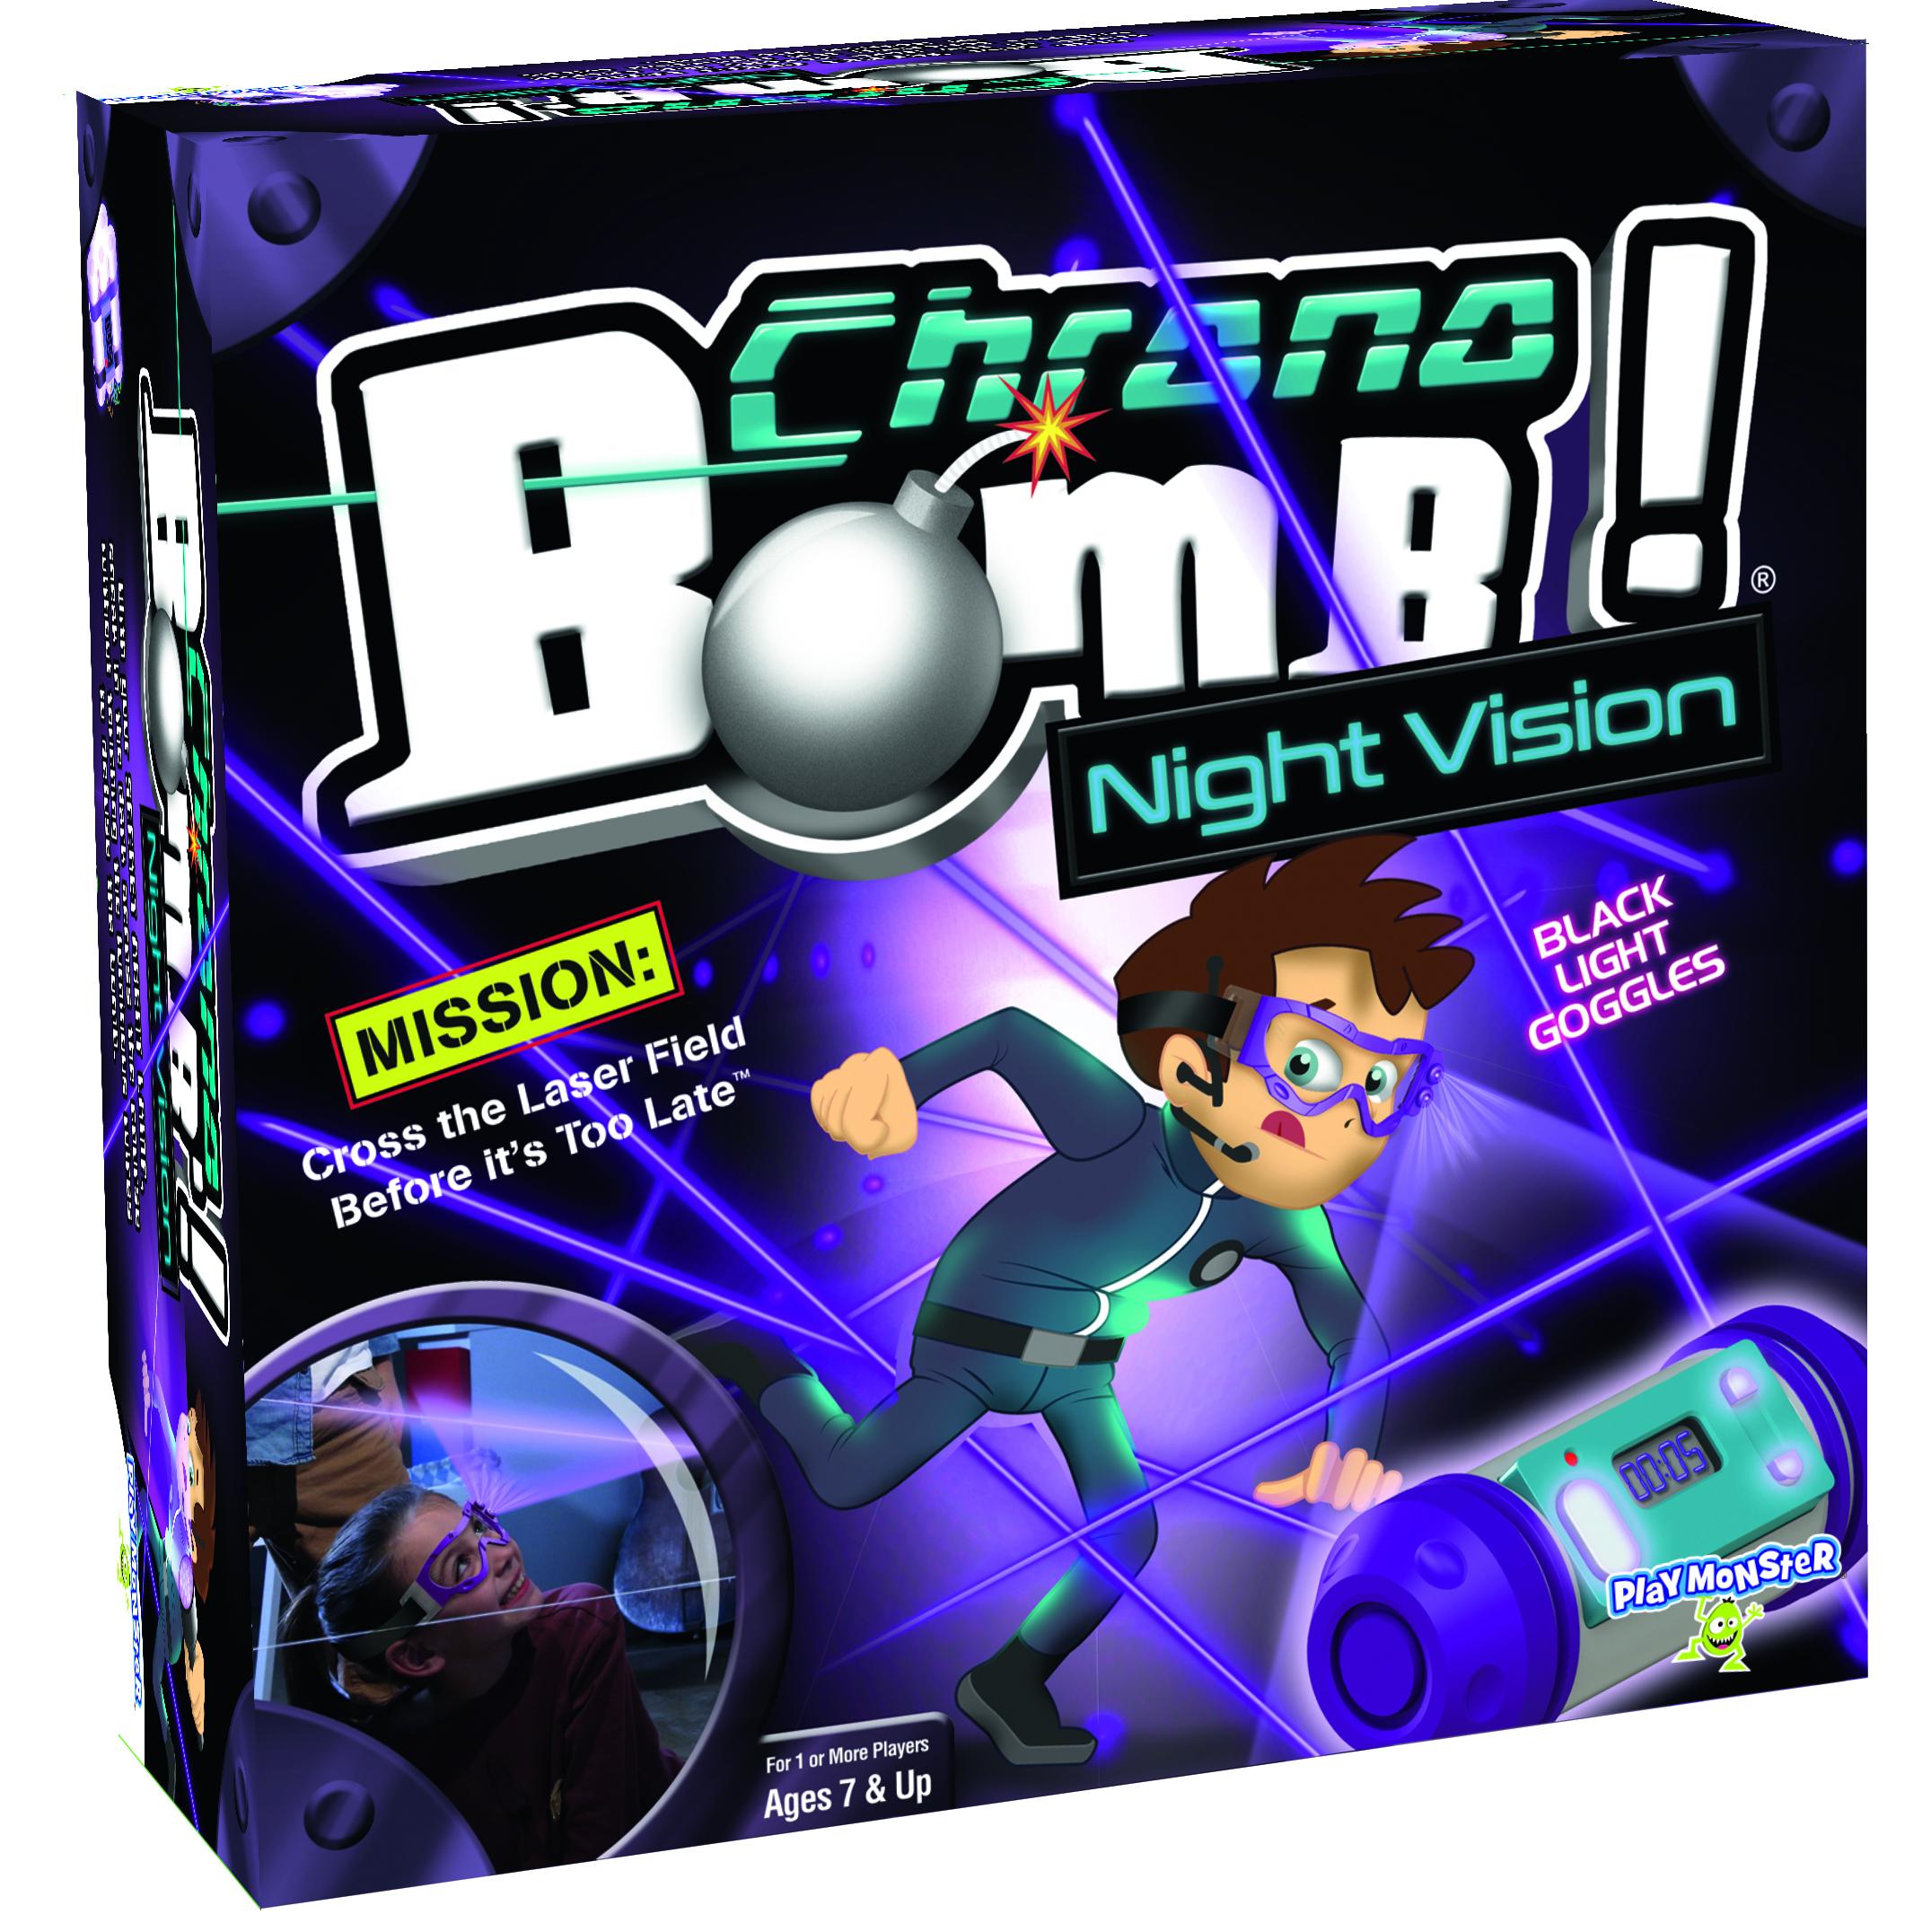 Chrono Bomb® Night Vision